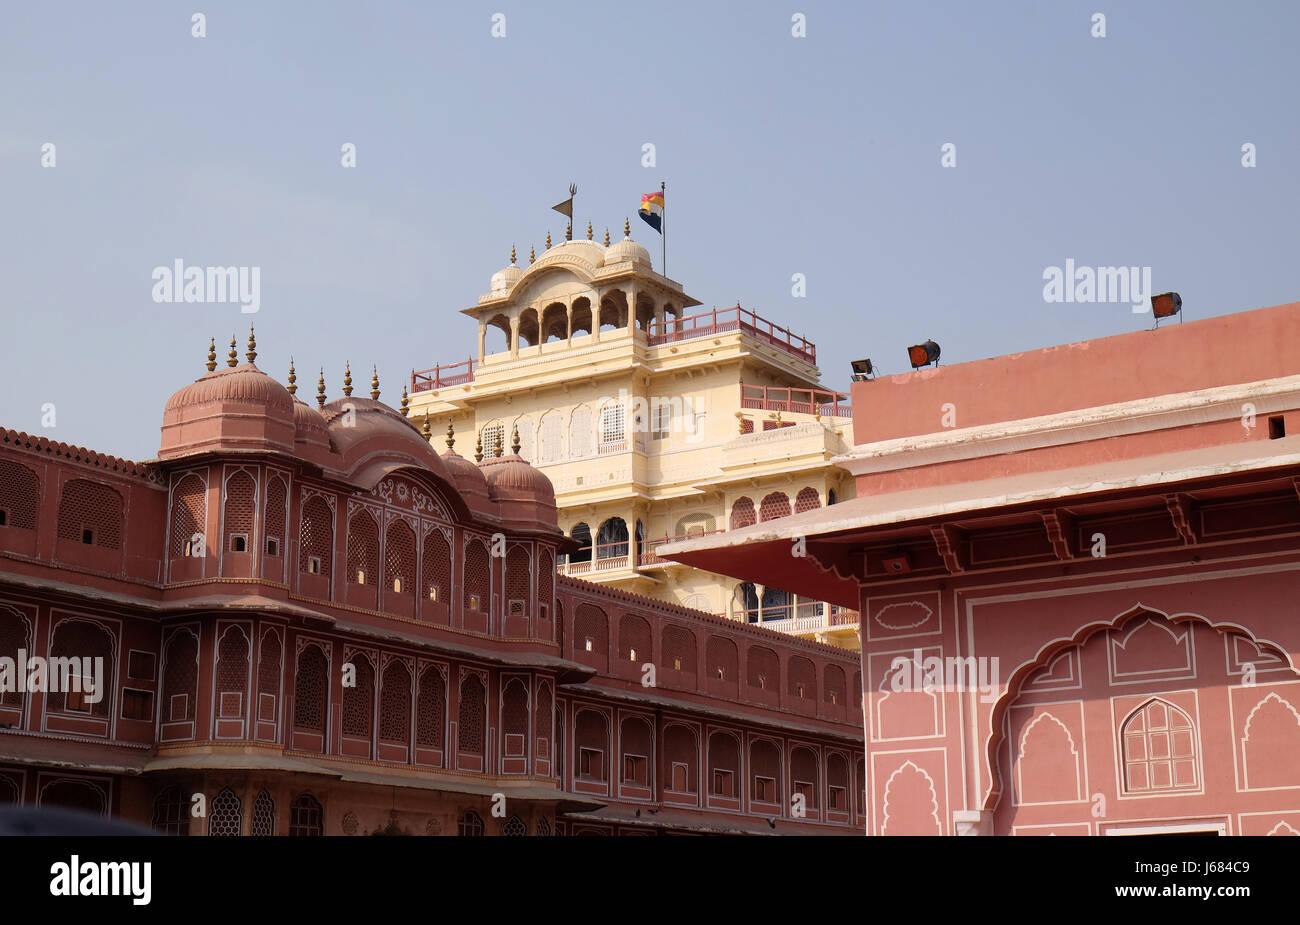 Chandra Mahal in Jaipur City Palace, Rajasthan, India. Palace was the seat of the Maharaja of Jaipur - Stock Image